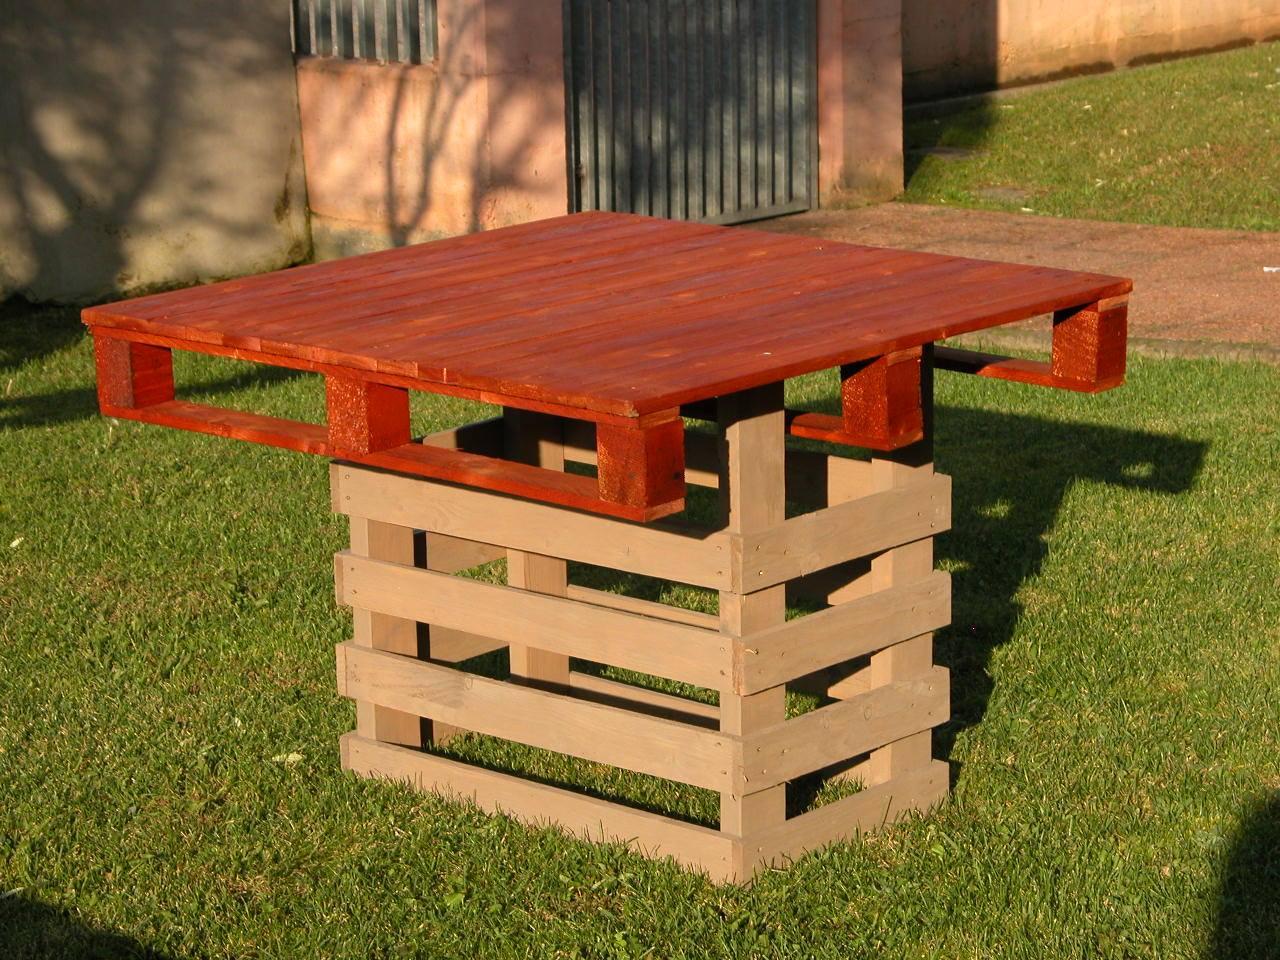 Tavoli per giardino mobili in pallet - Tavolo giardino ...